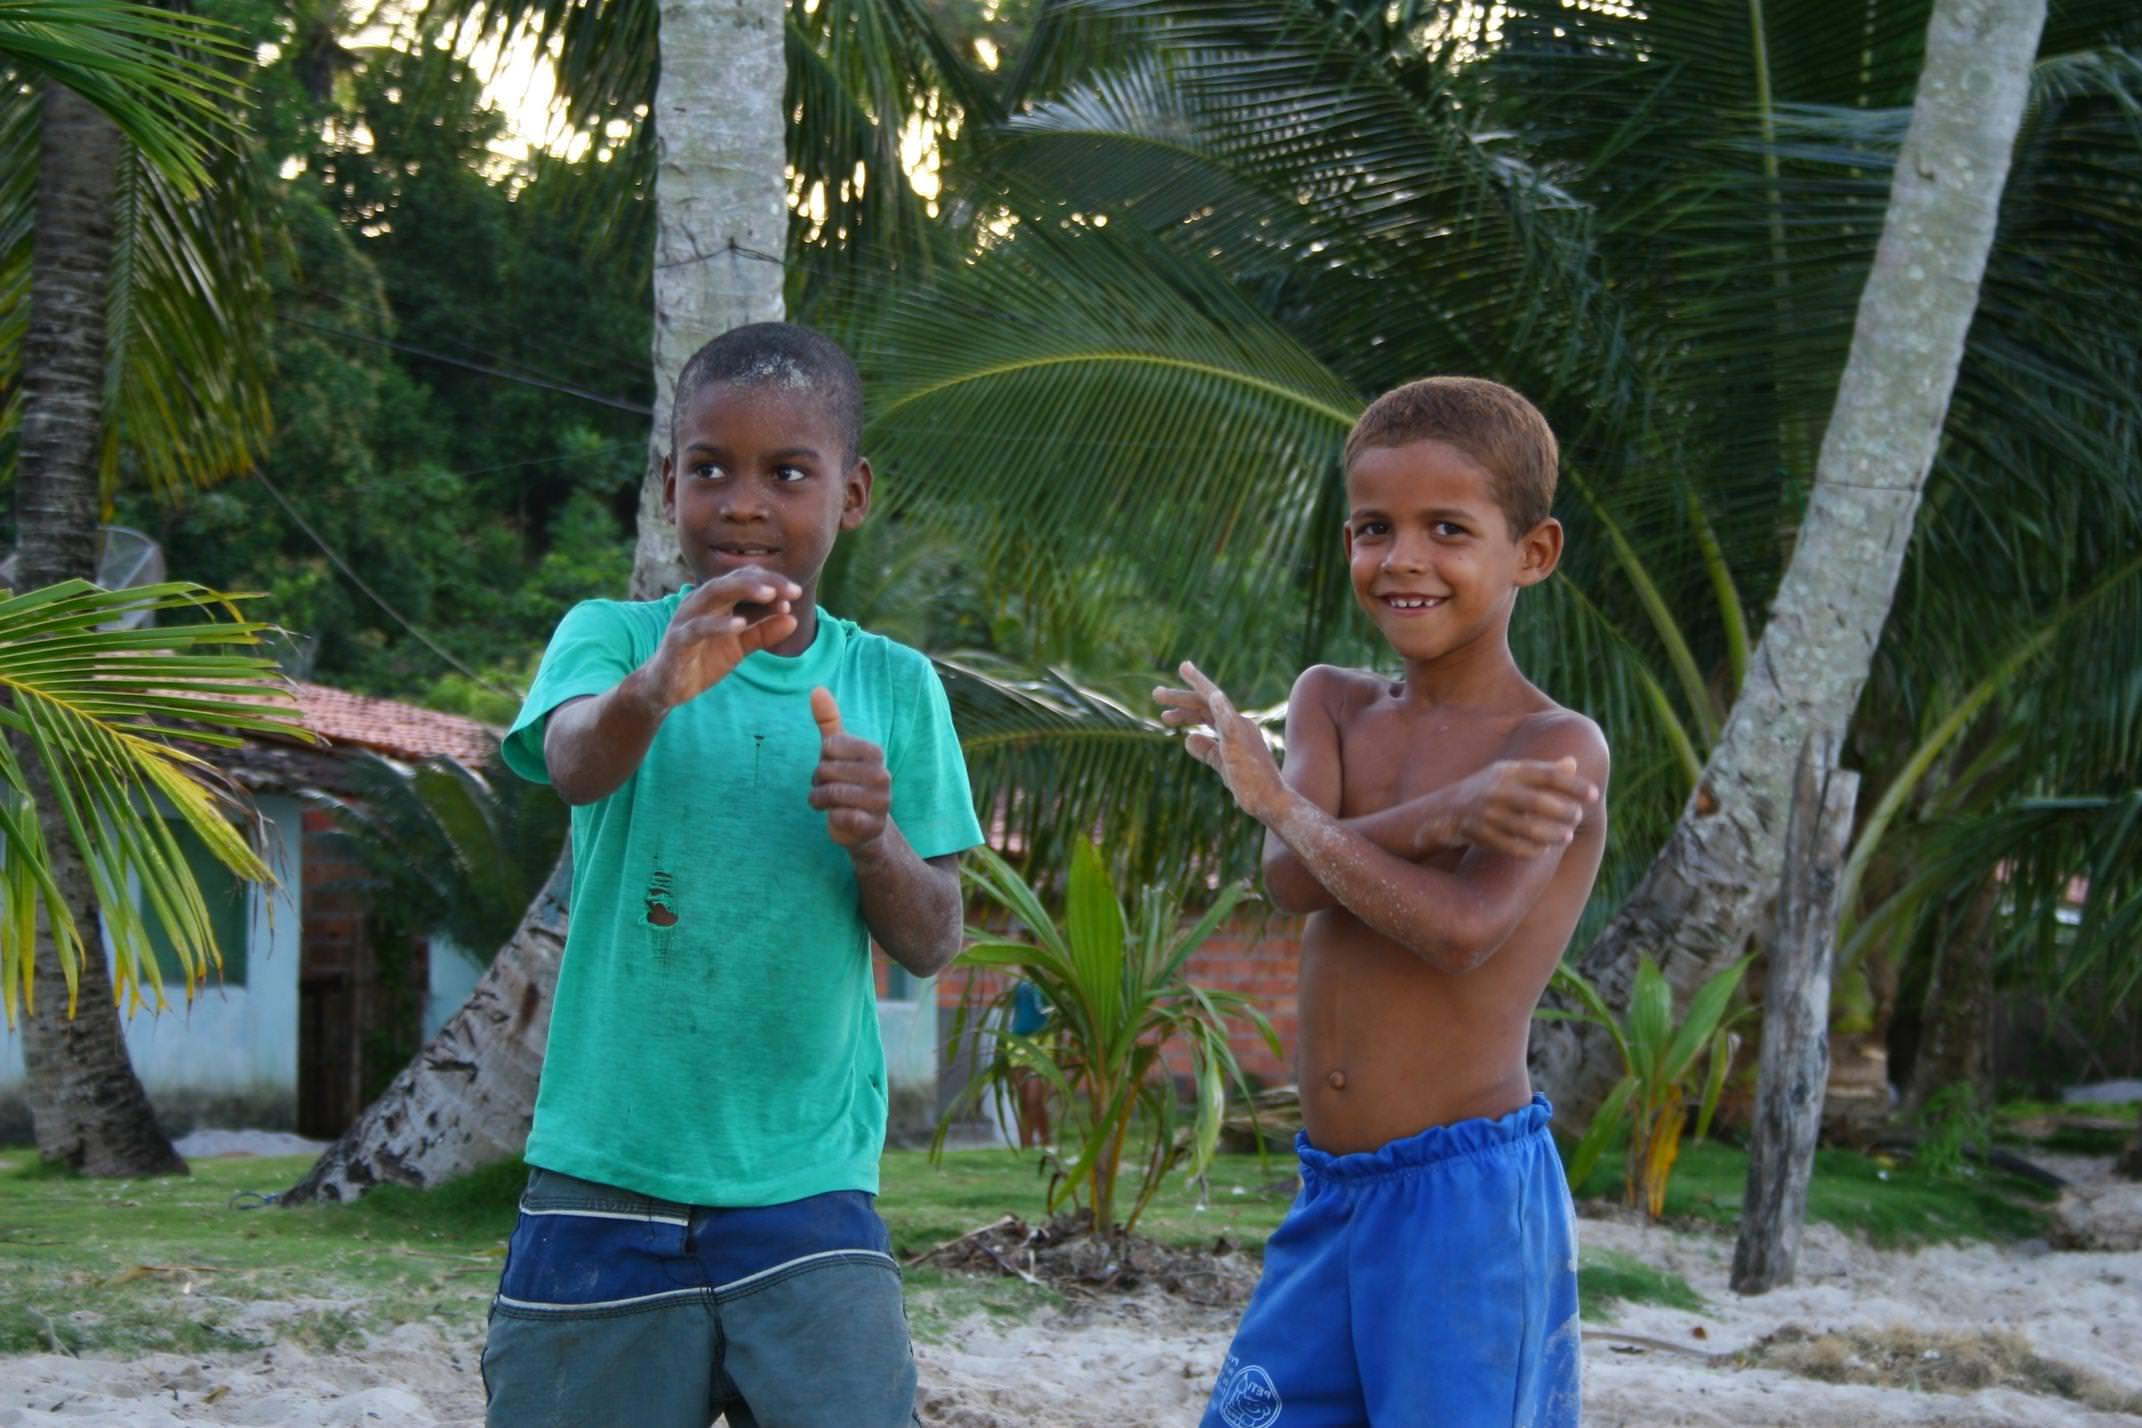 Brazil bahia boipeba island smiling children